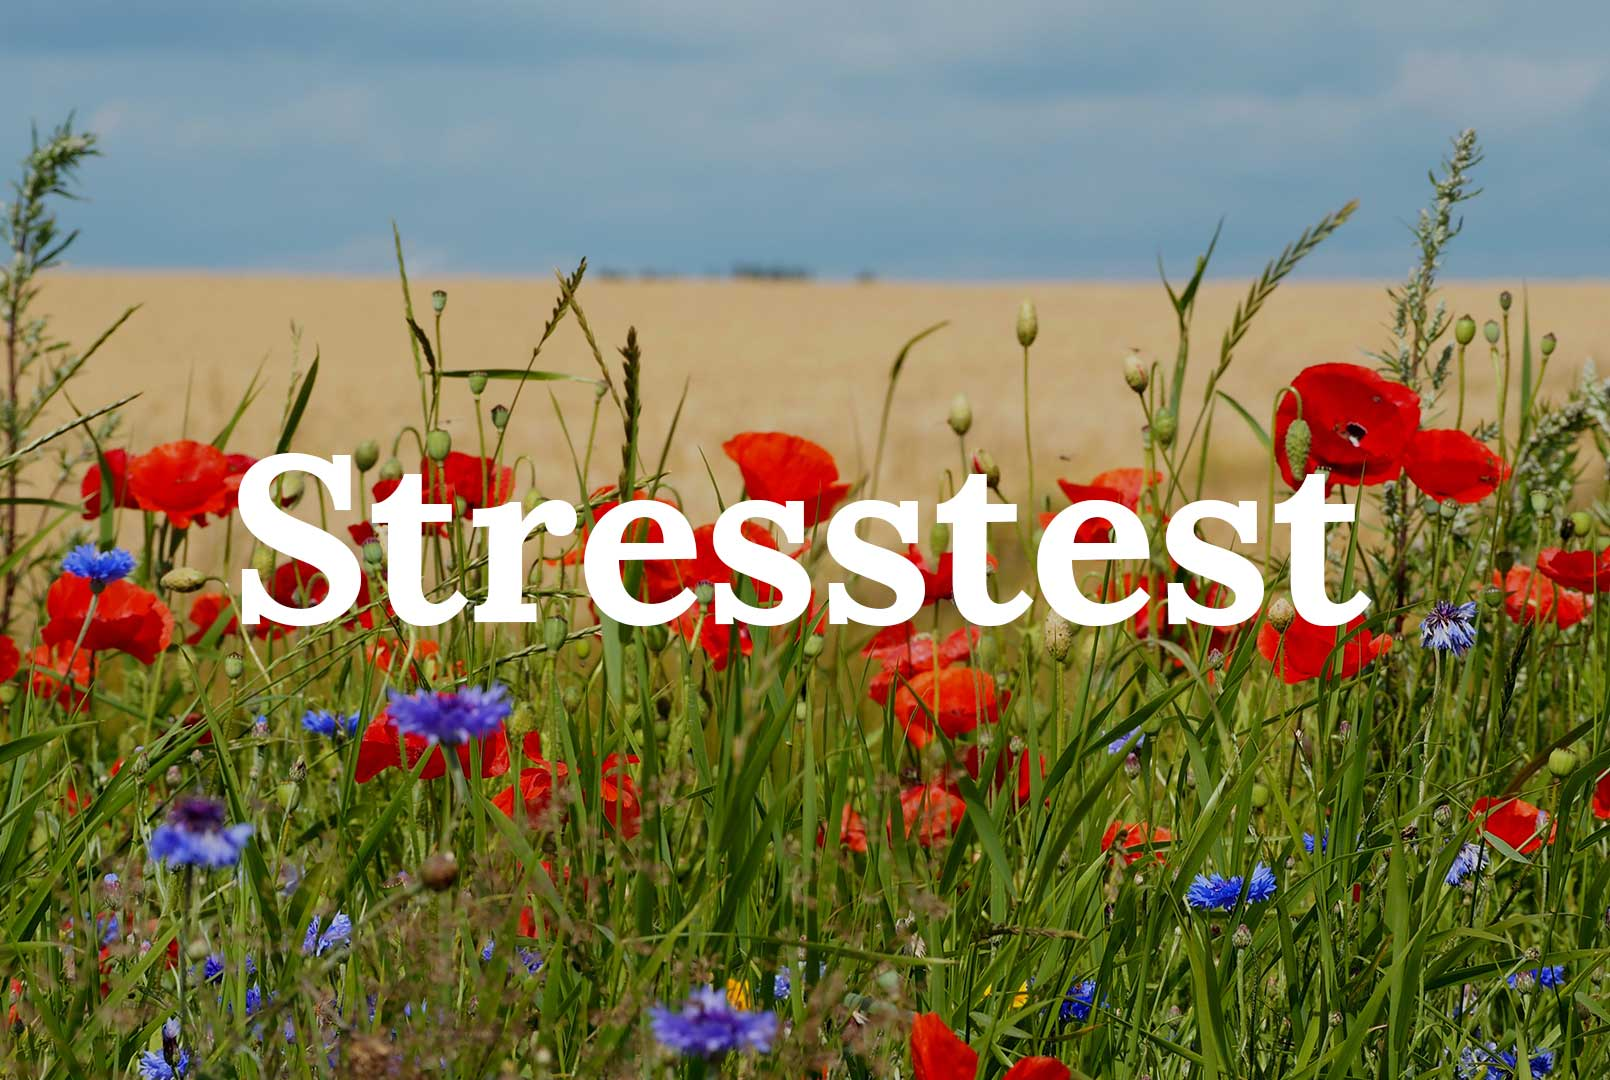 Tag en stresstest